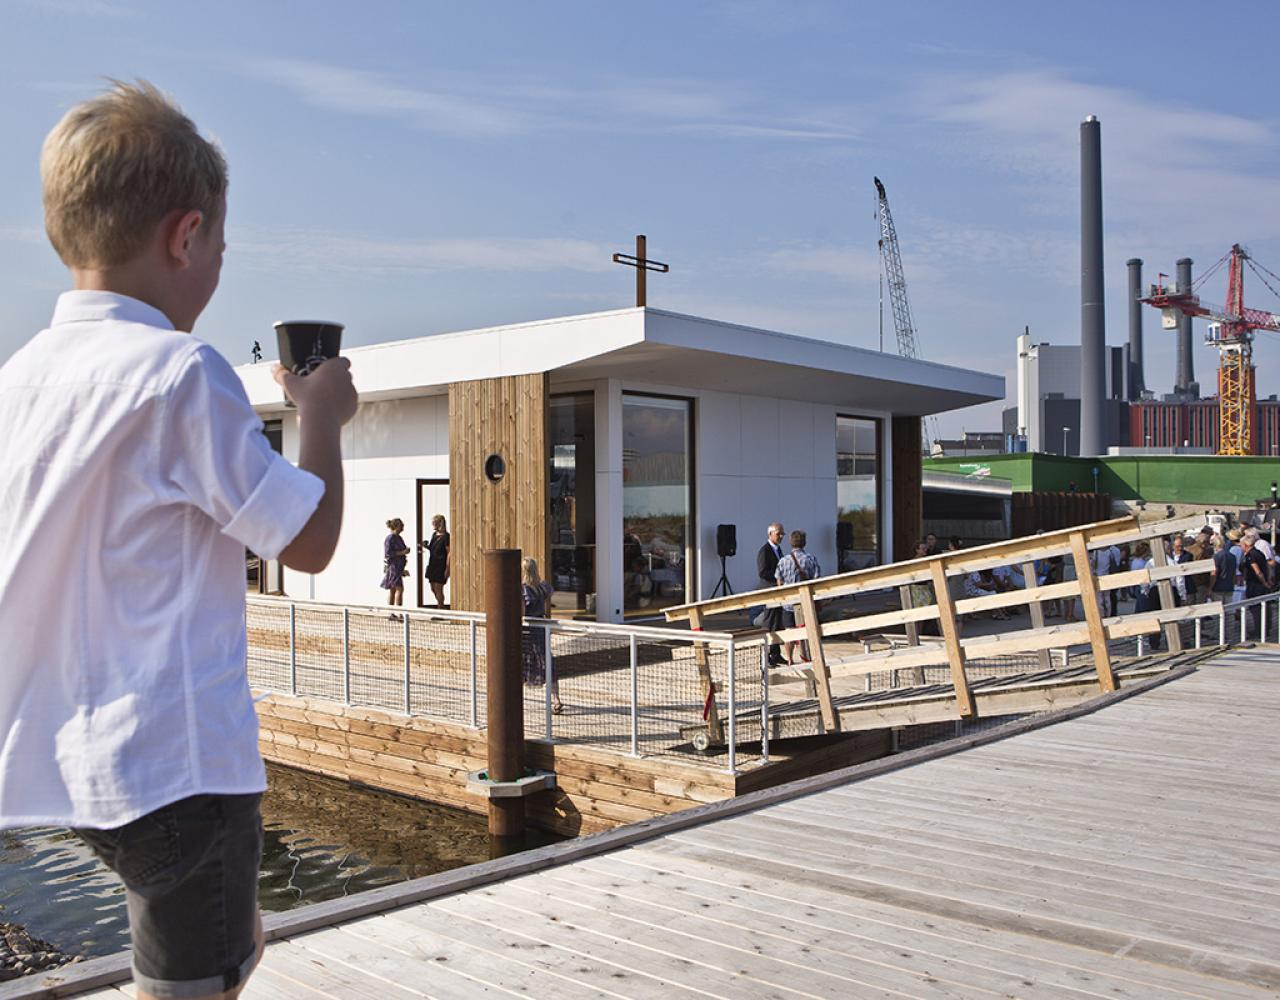 kirkeskibet teglholmen